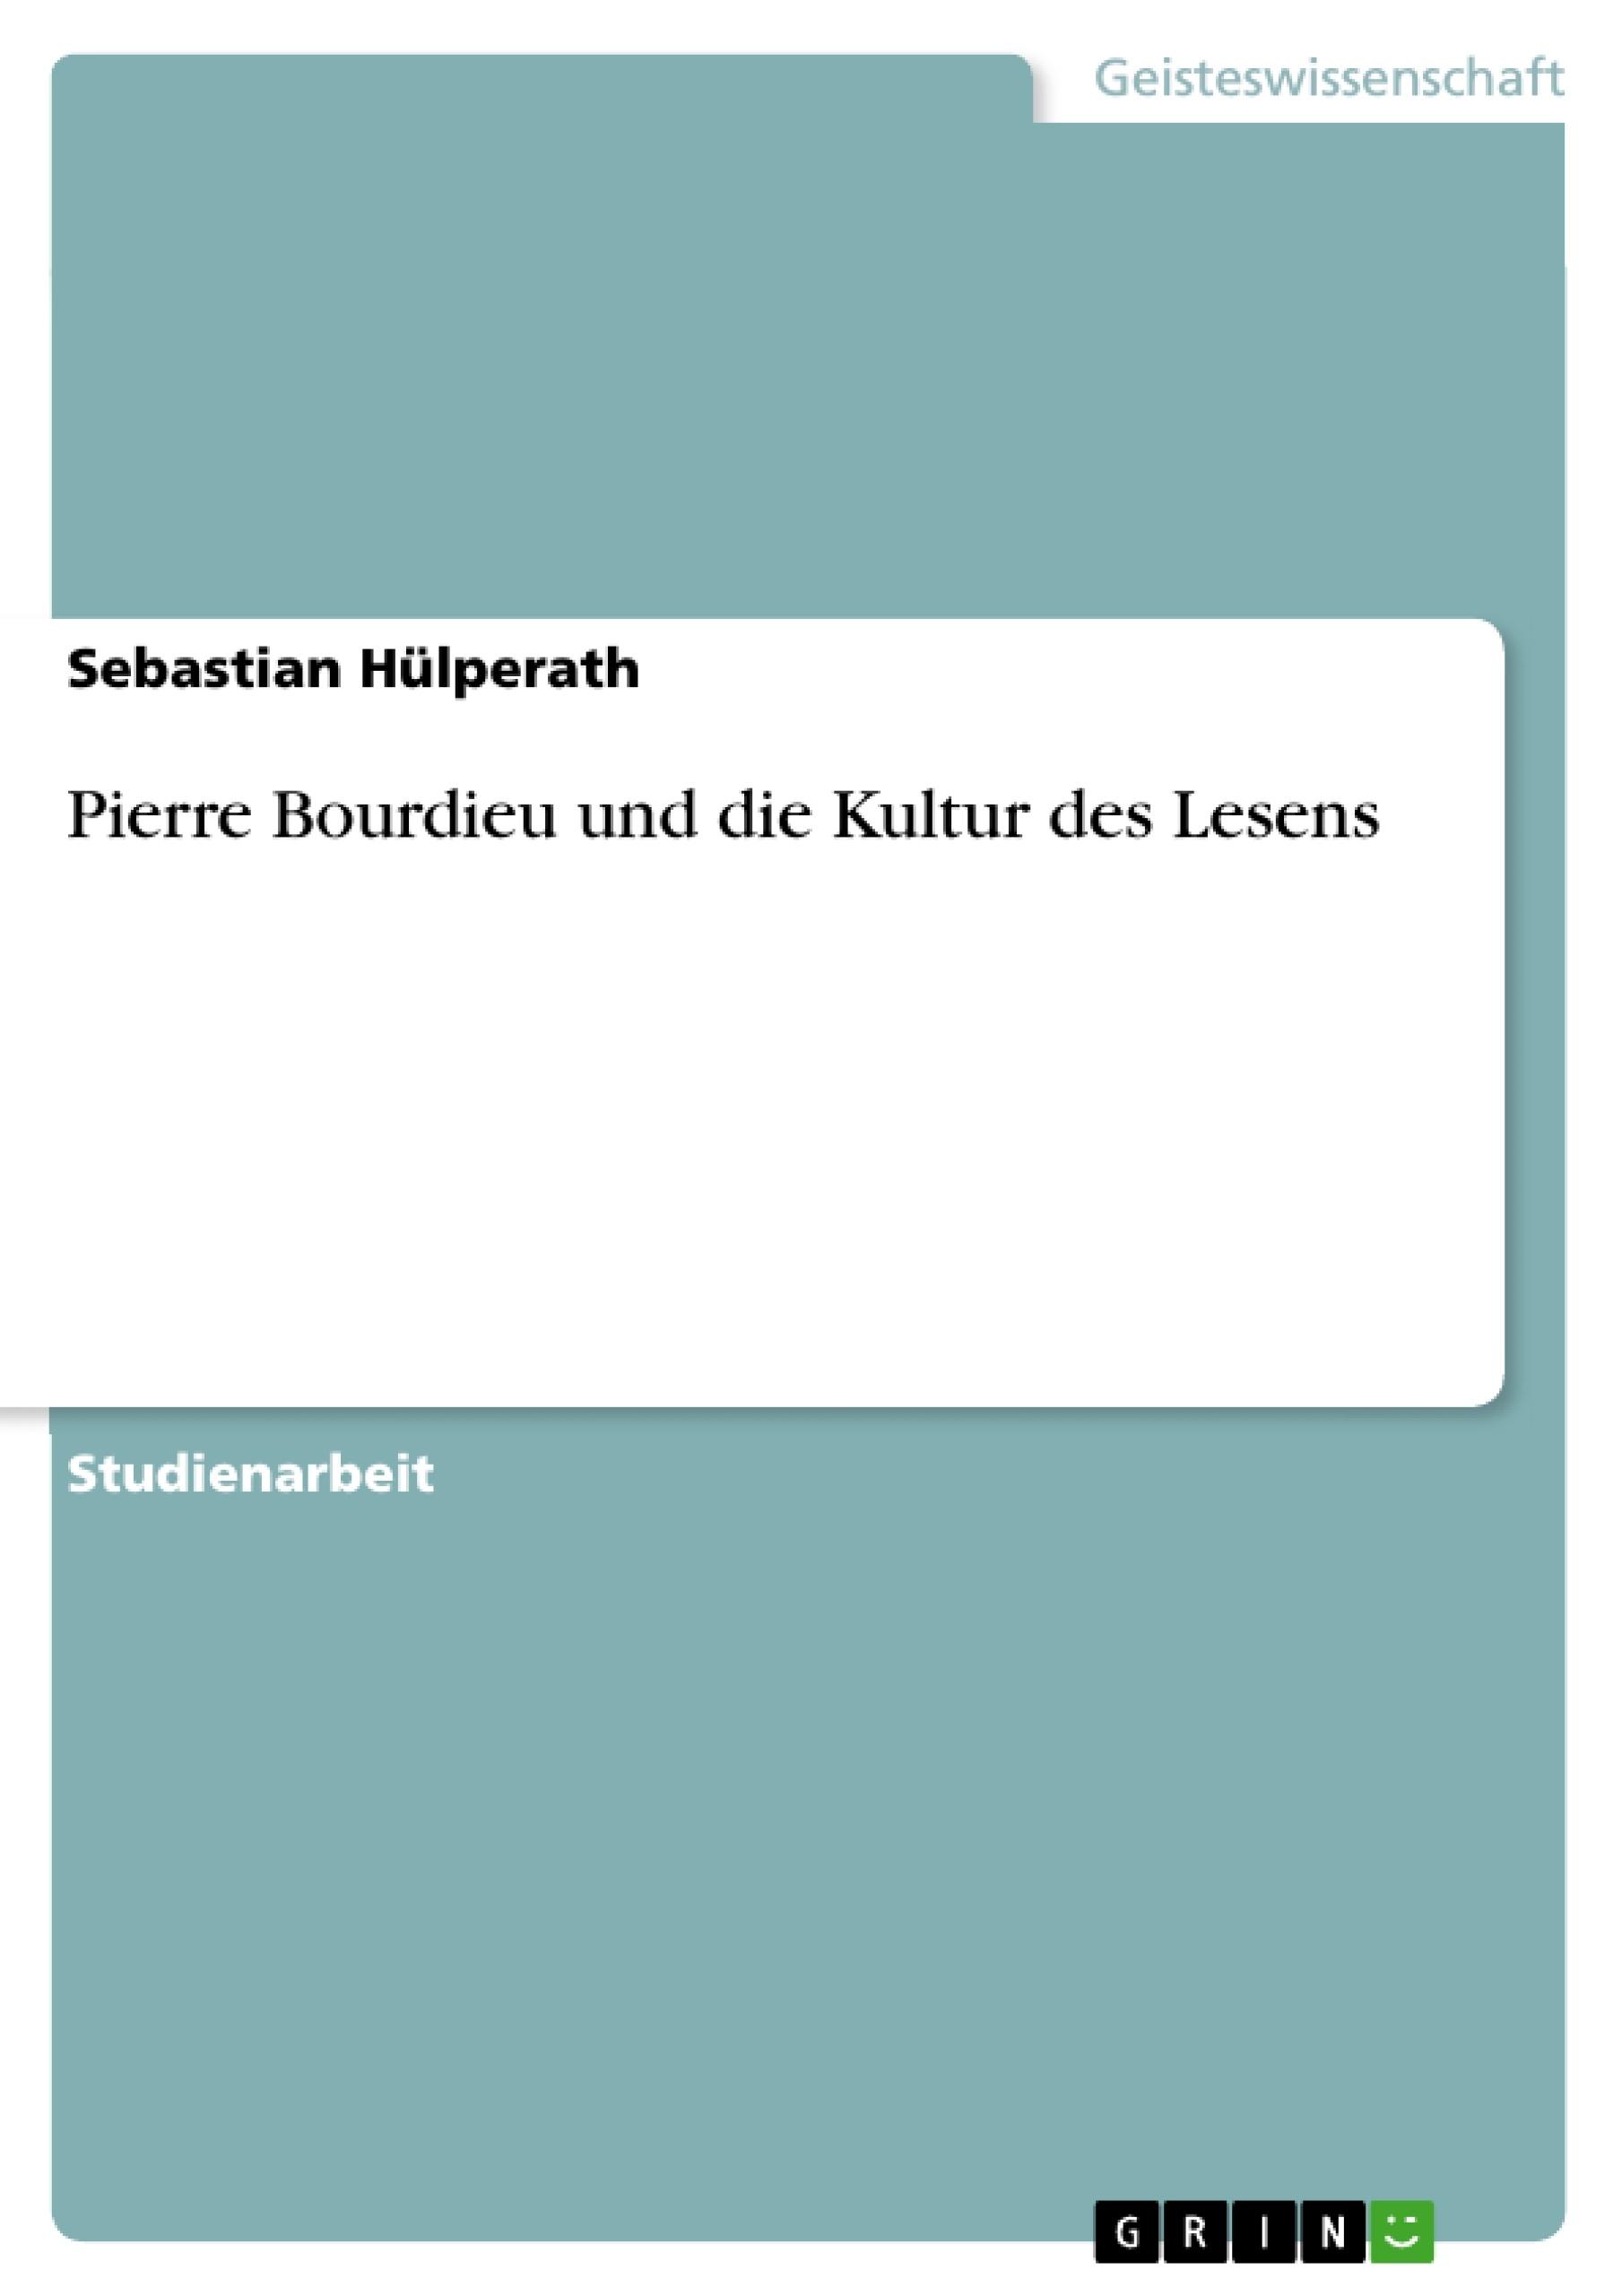 Titel: Pierre Bourdieu und die Kultur des Lesens